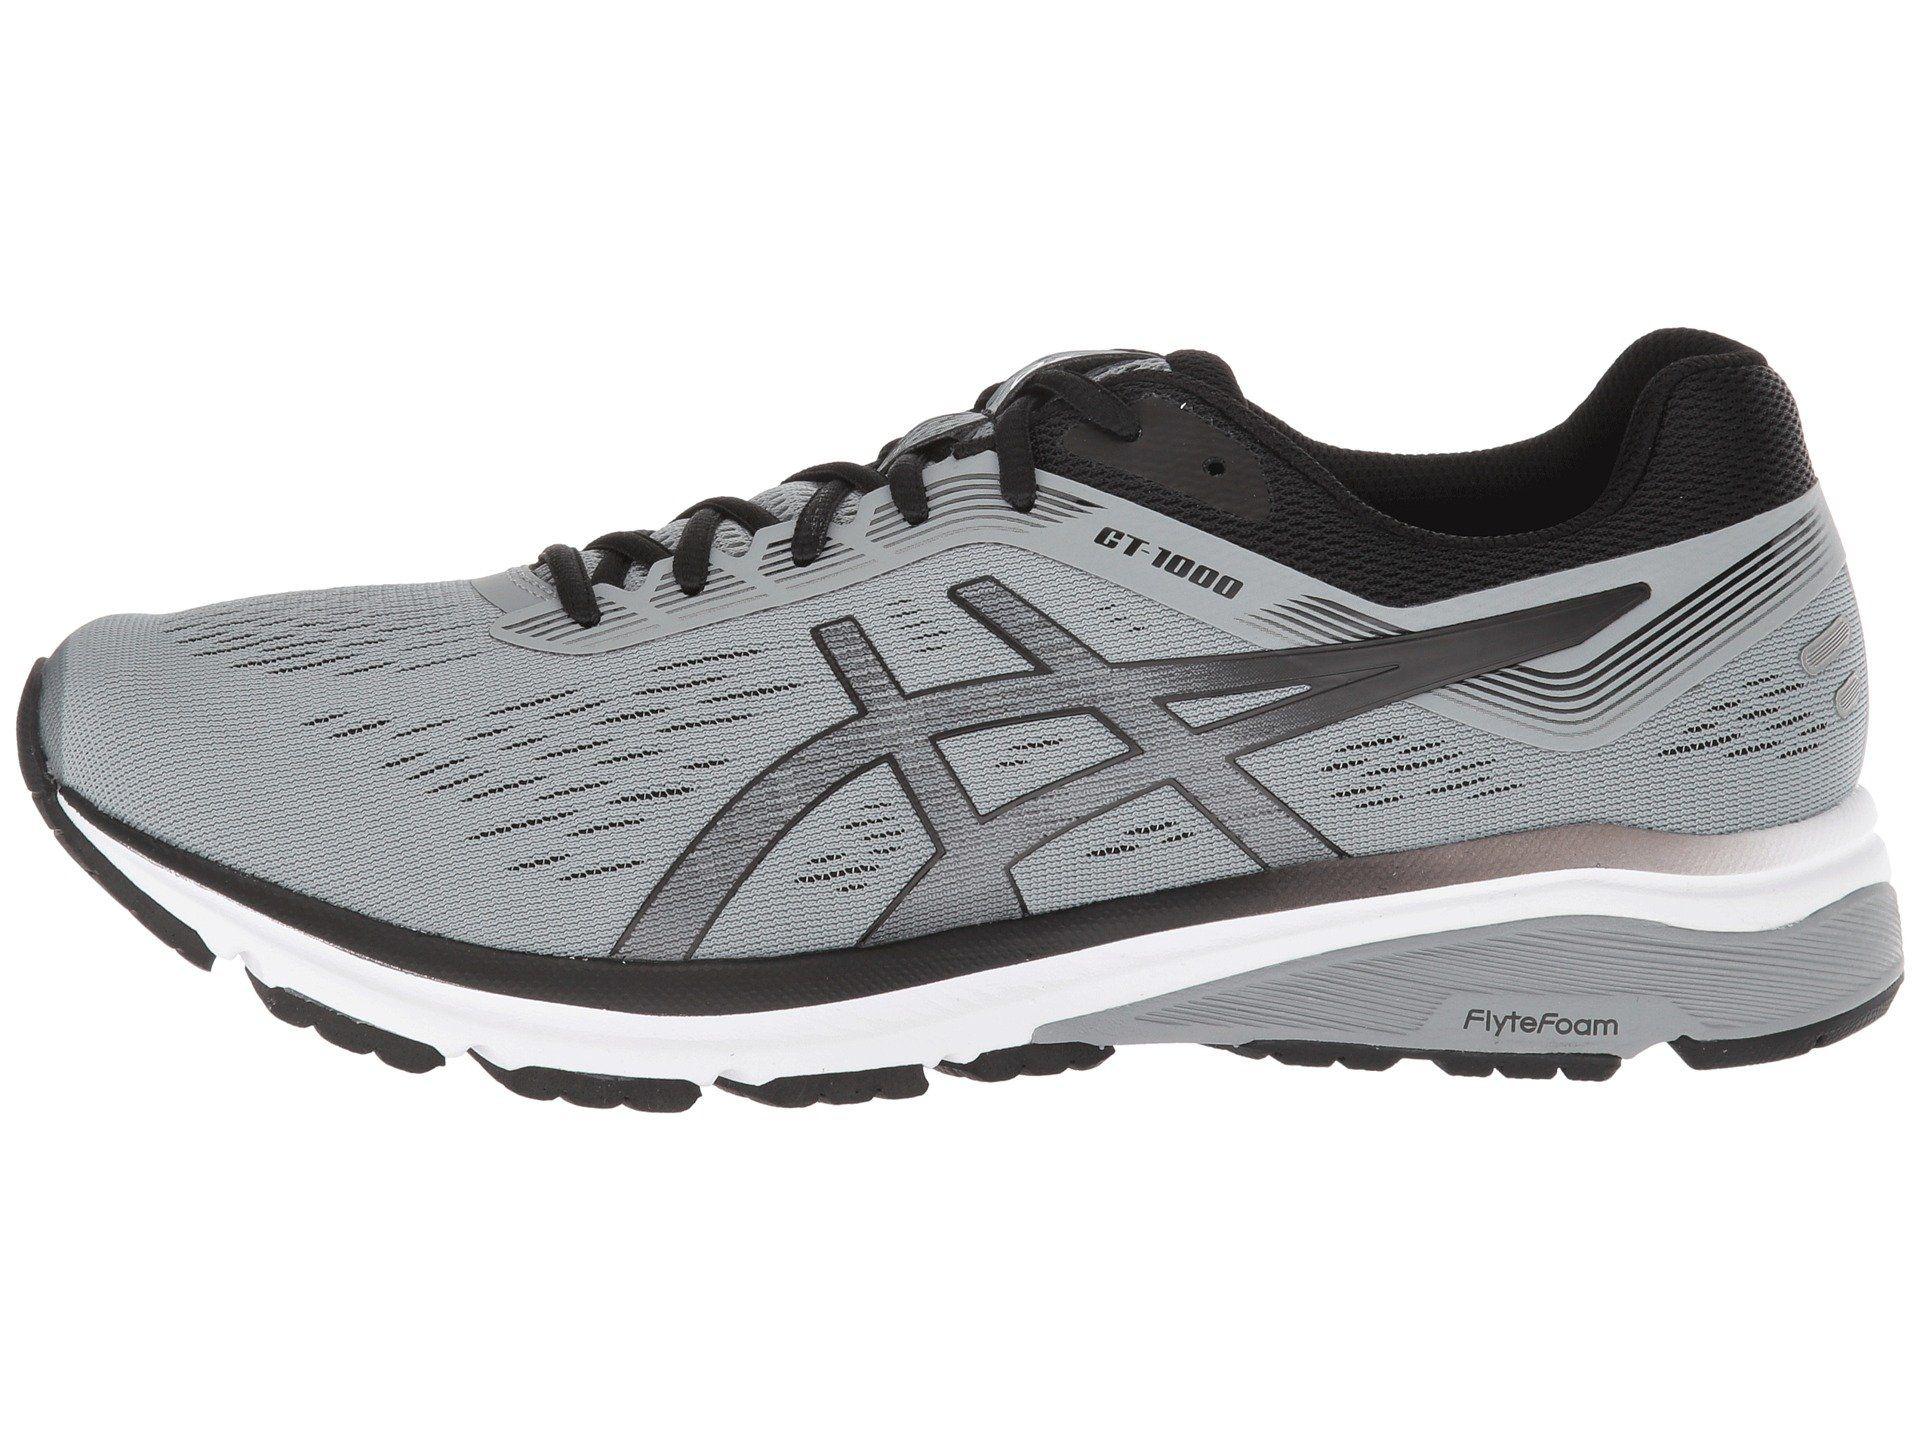 Asics Running Shoes   Best Asics Shoes 2019